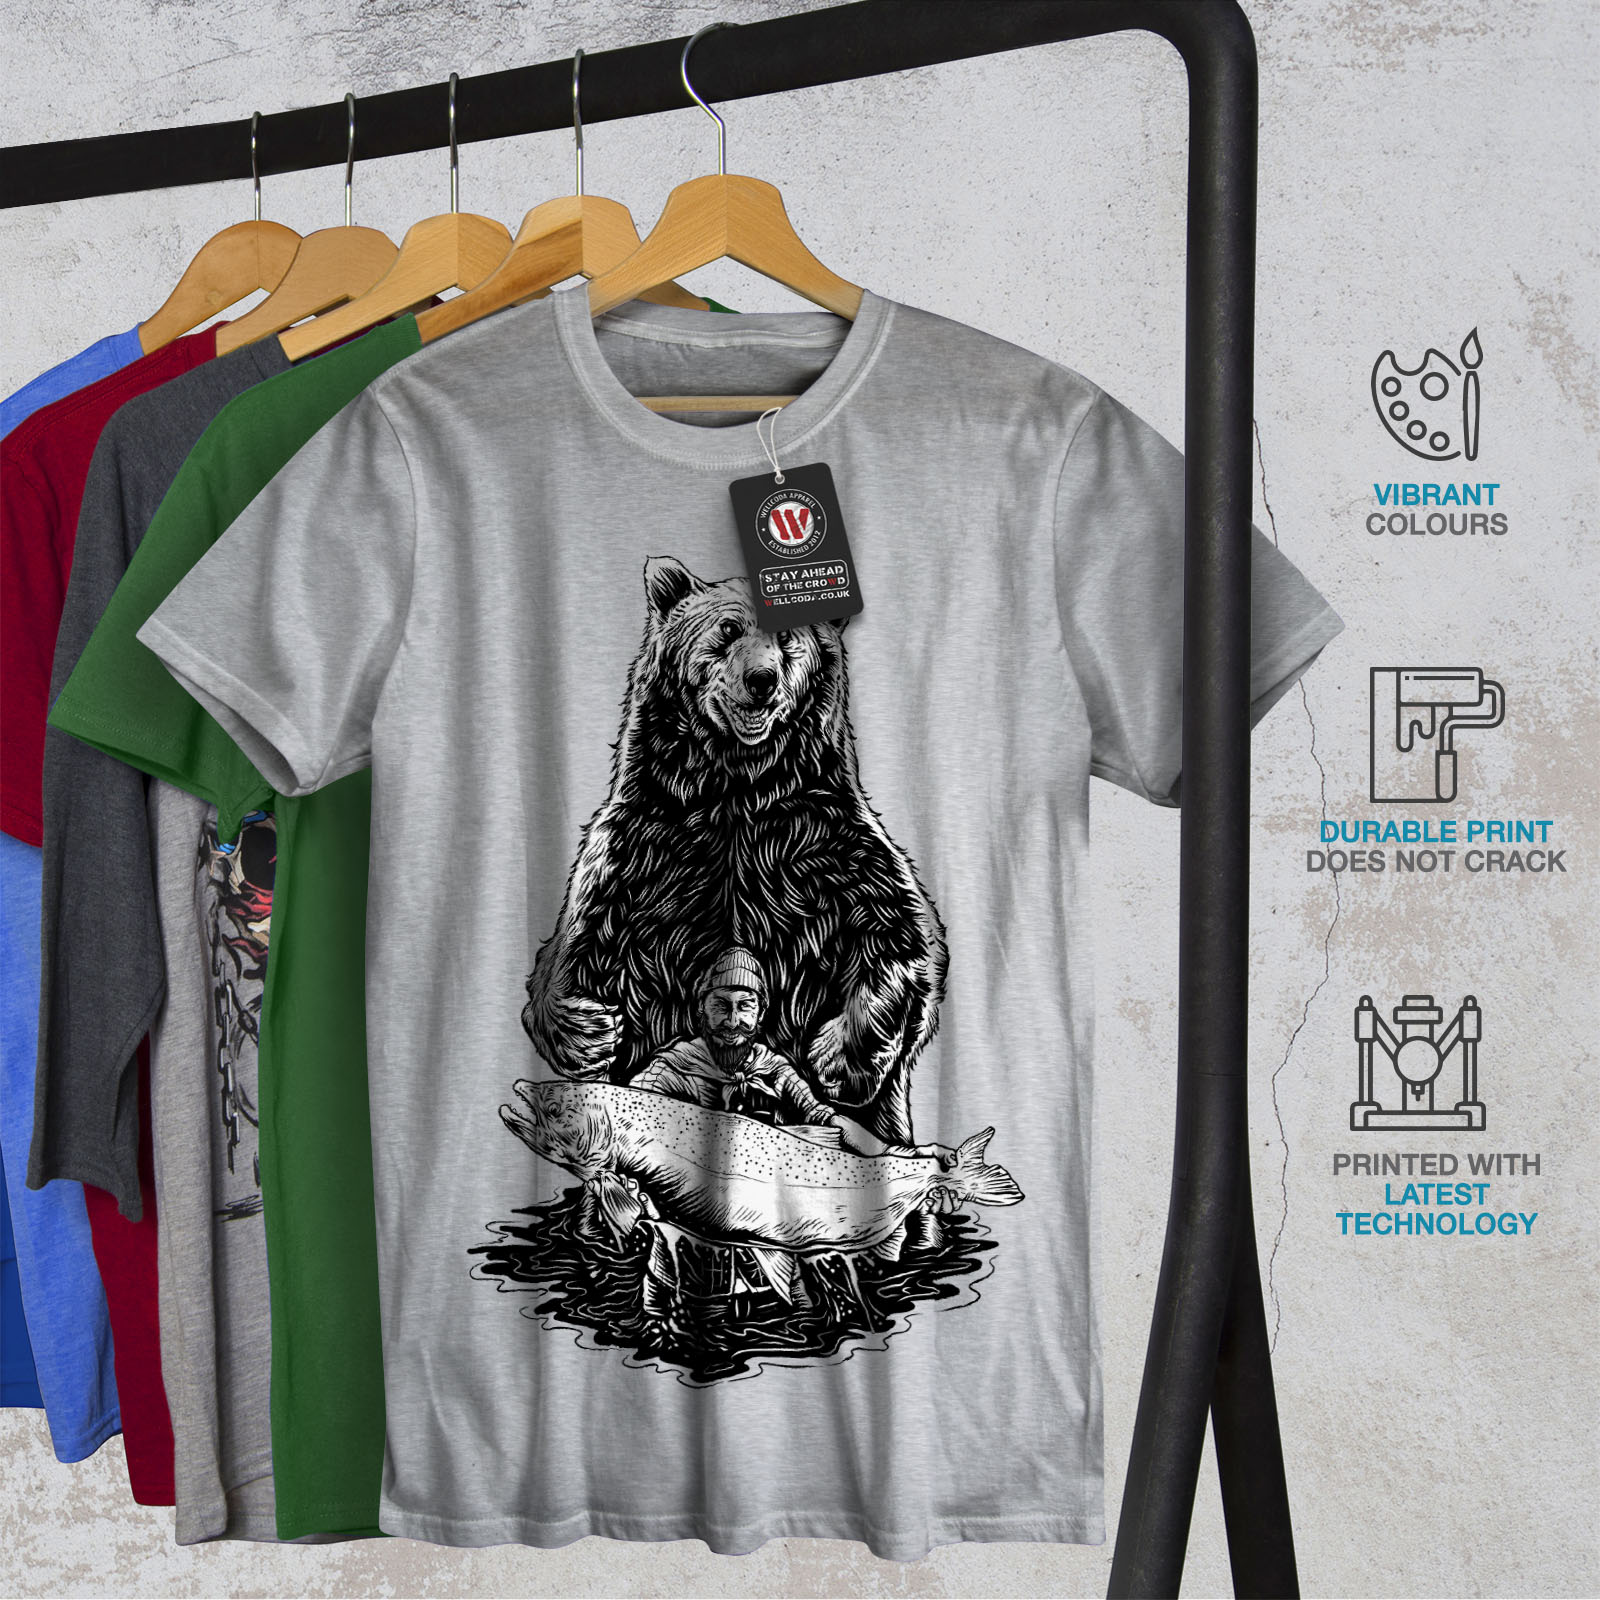 miniature 18 - Wellcoda Fishing Bear Angler Mens T-shirt, Grizzly Graphic Design Printed Tee